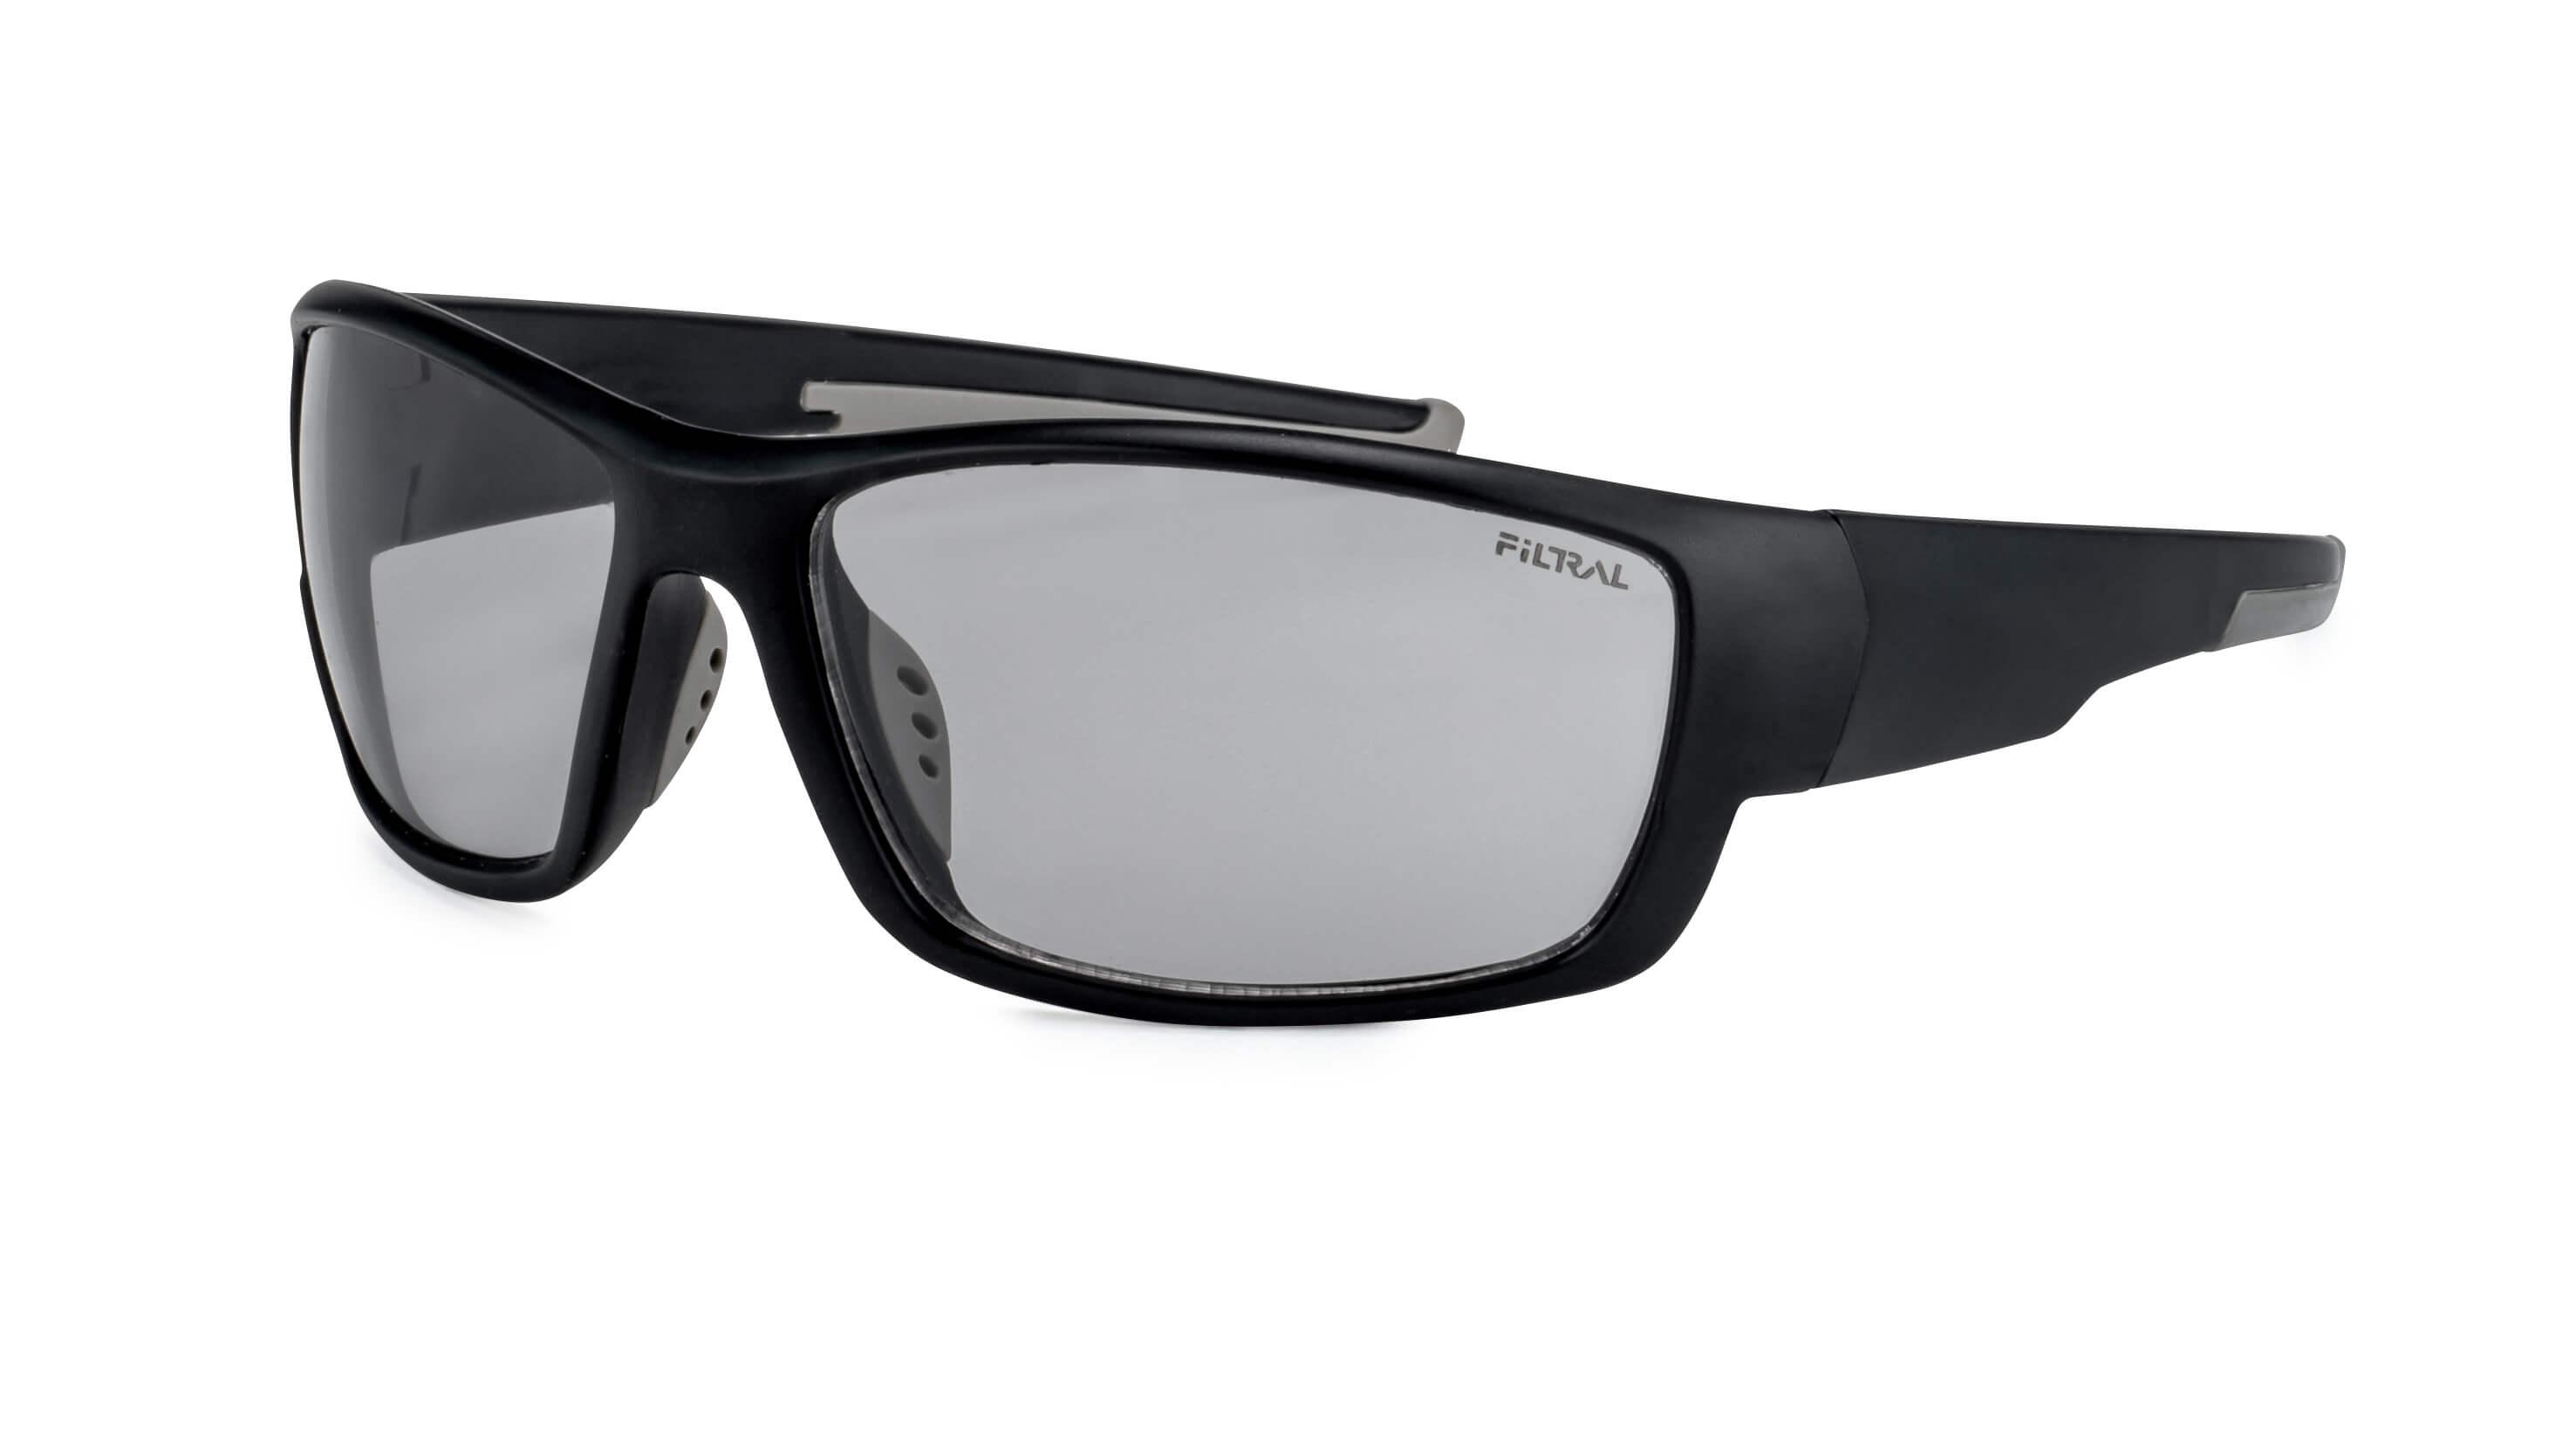 Main view sunglasses F3025700